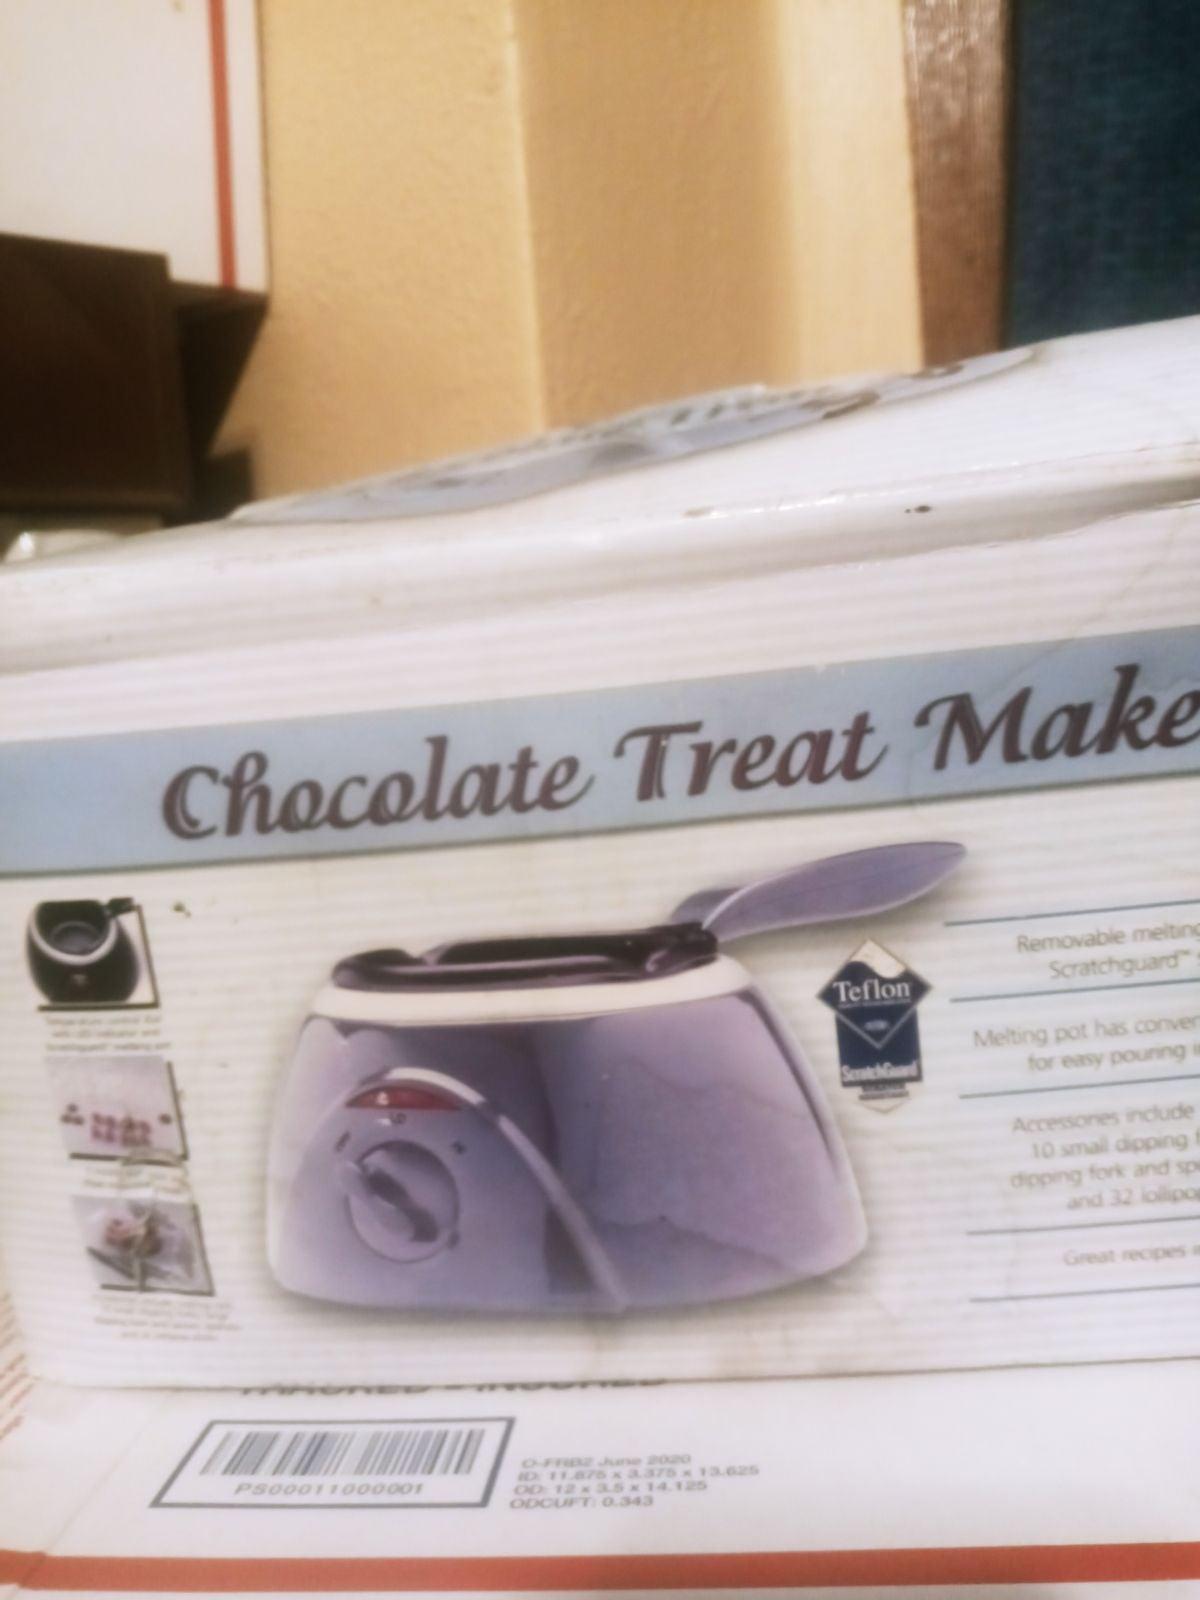 New in Box Chocolate Treat Maker